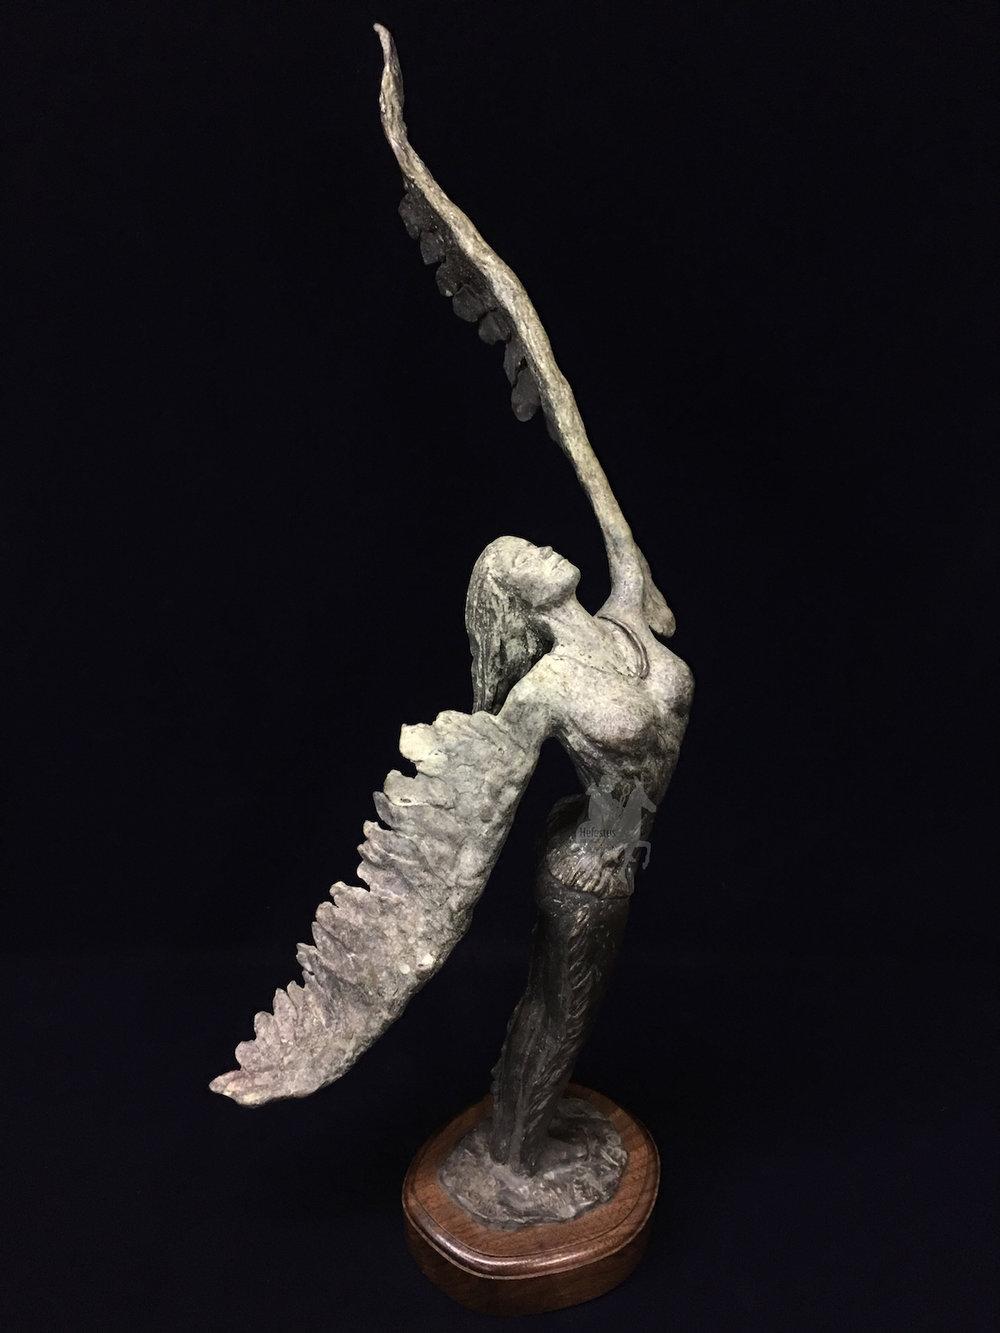 Raven-JerryVaughn-1.jpg